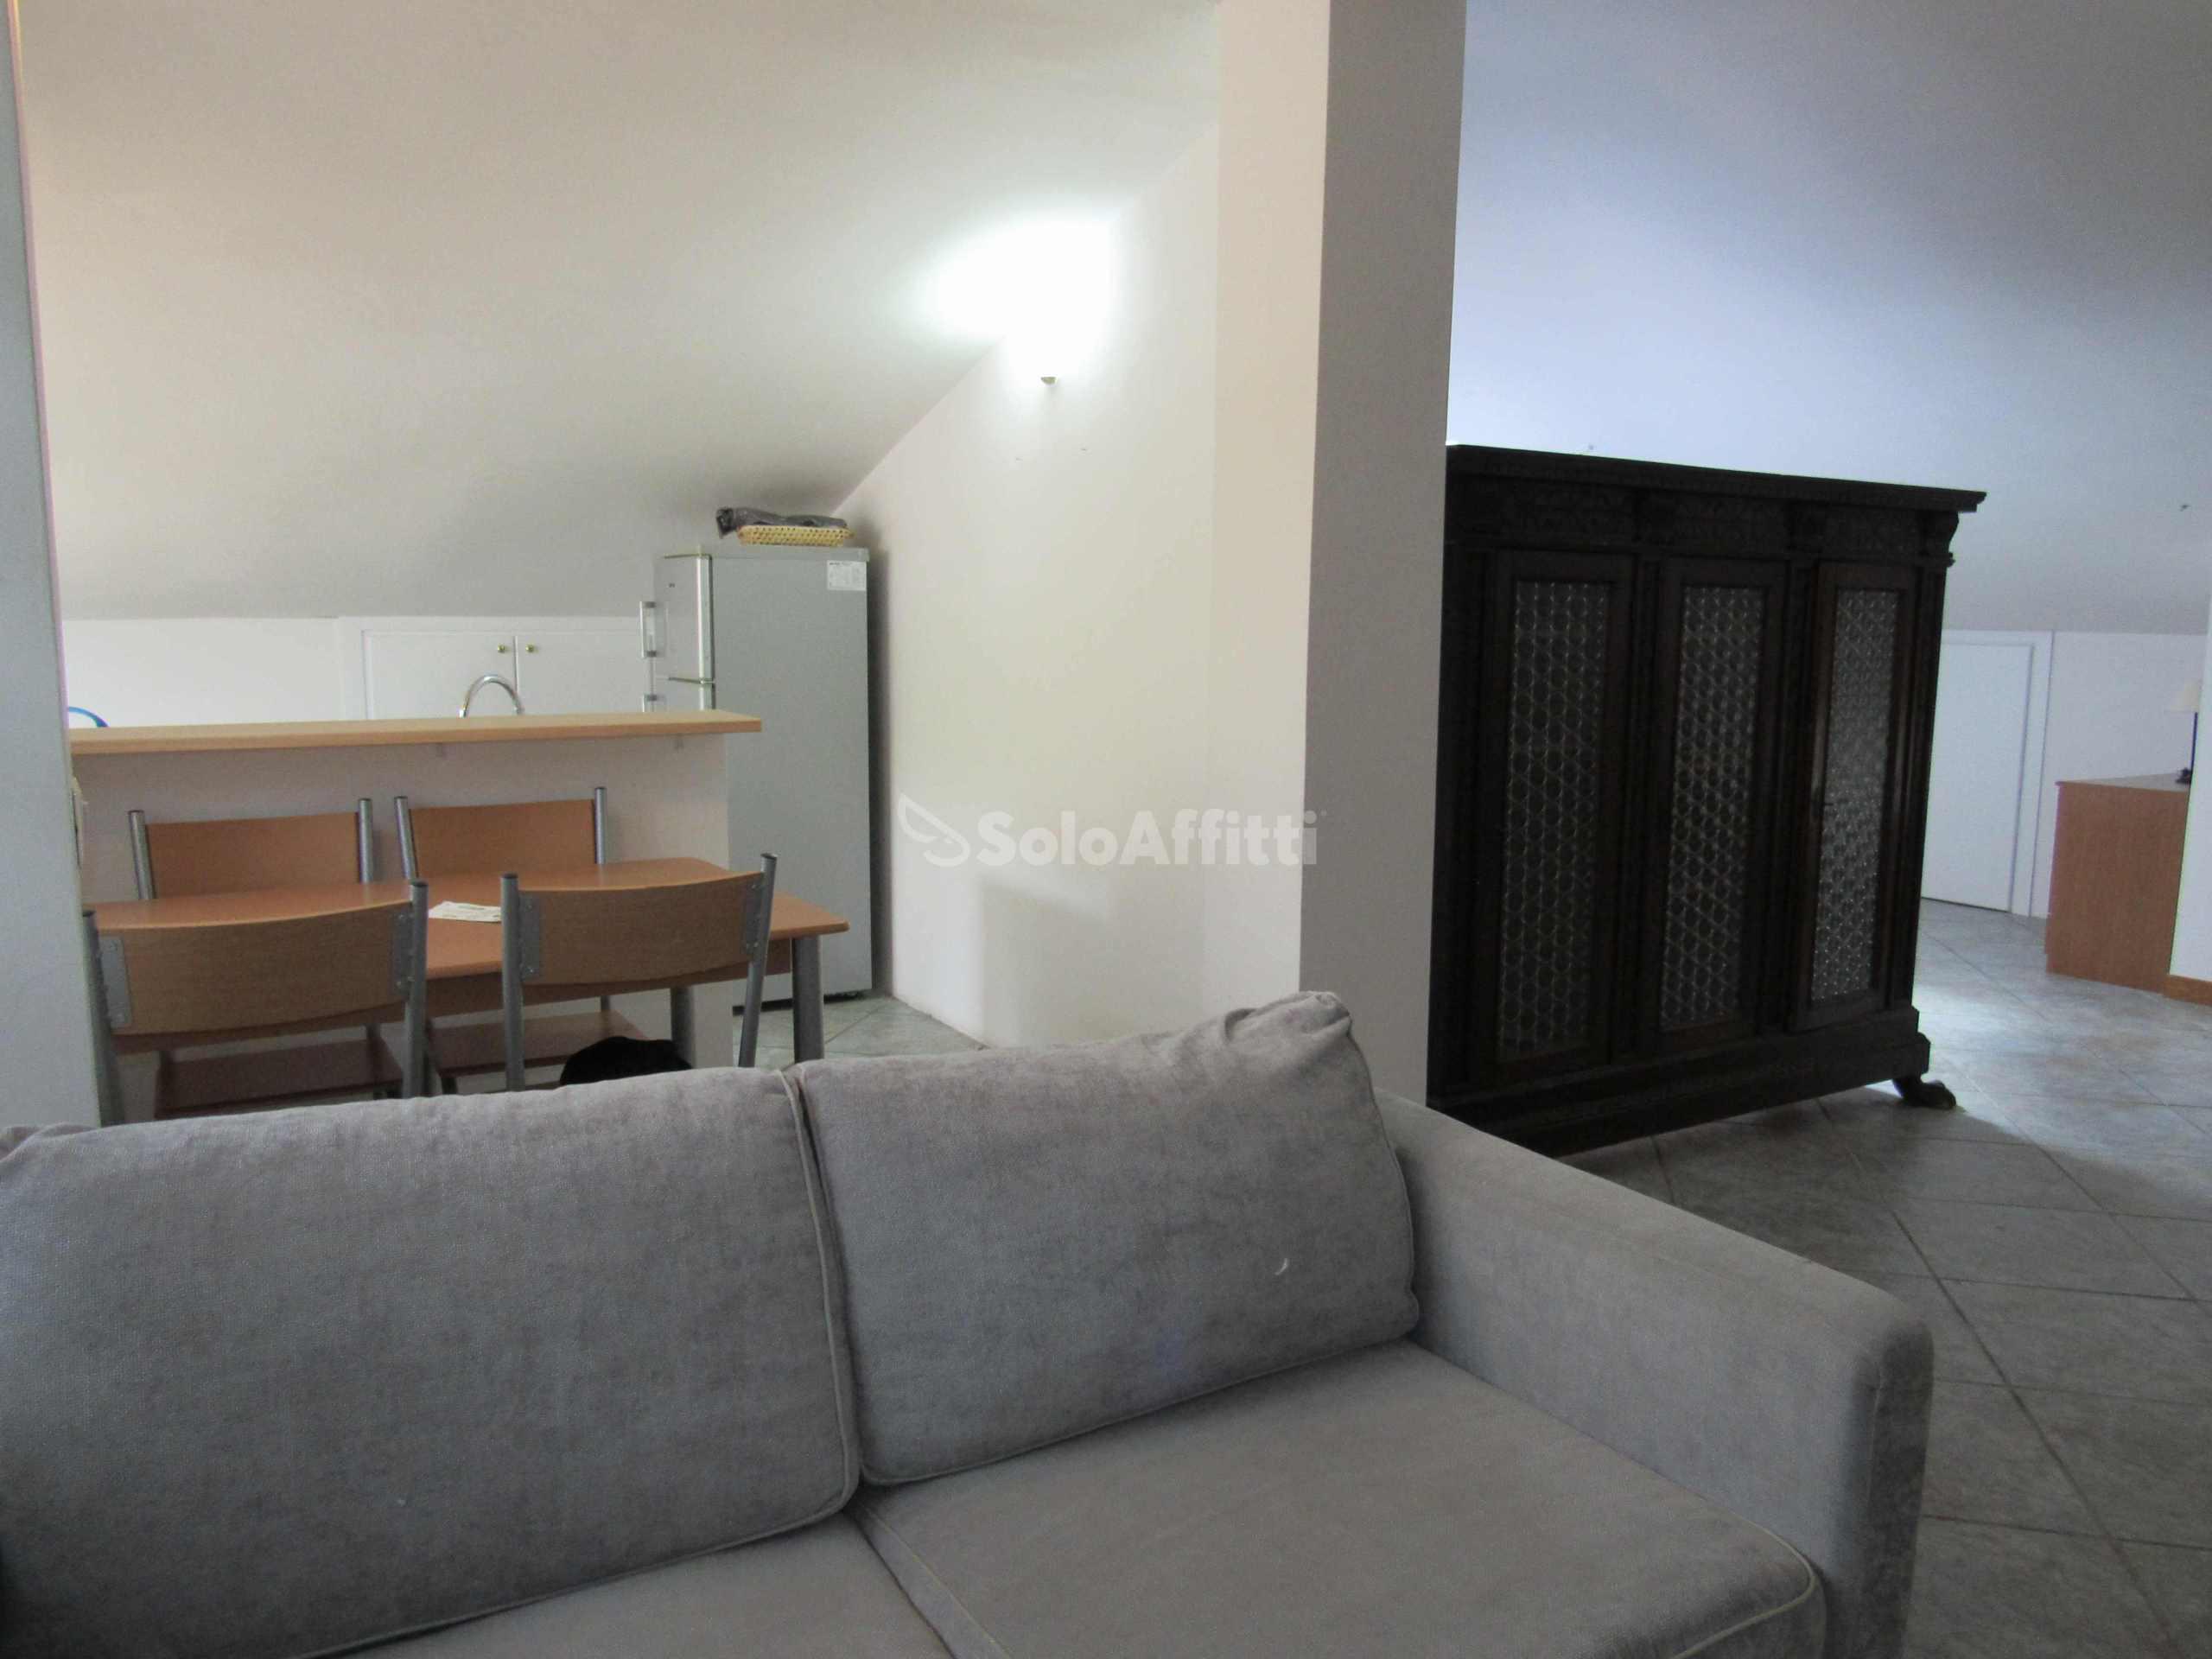 Appartamento Mansarda Arredato 35 mq.